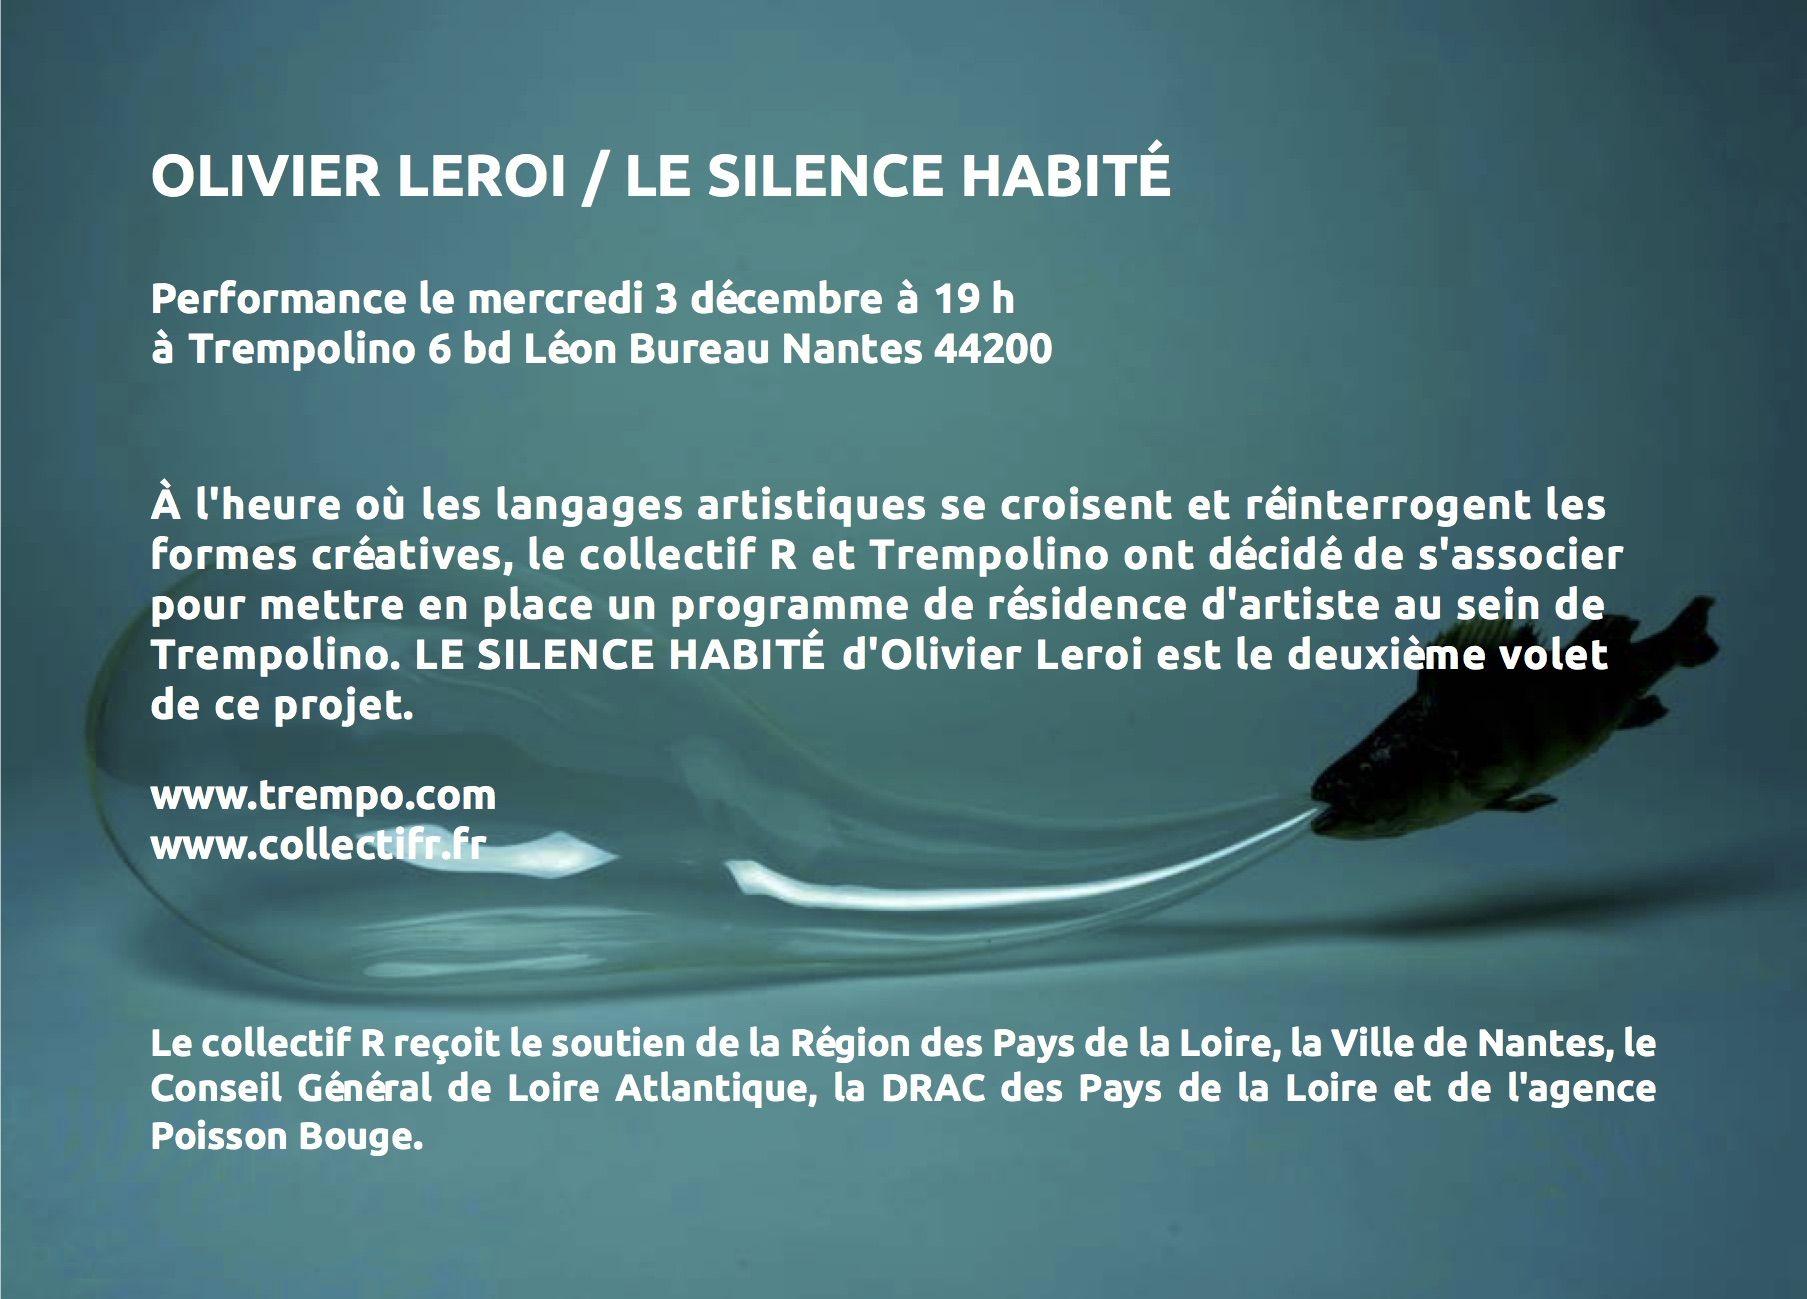 Olivier Leroi Le silence habit Performance le mercredi 3